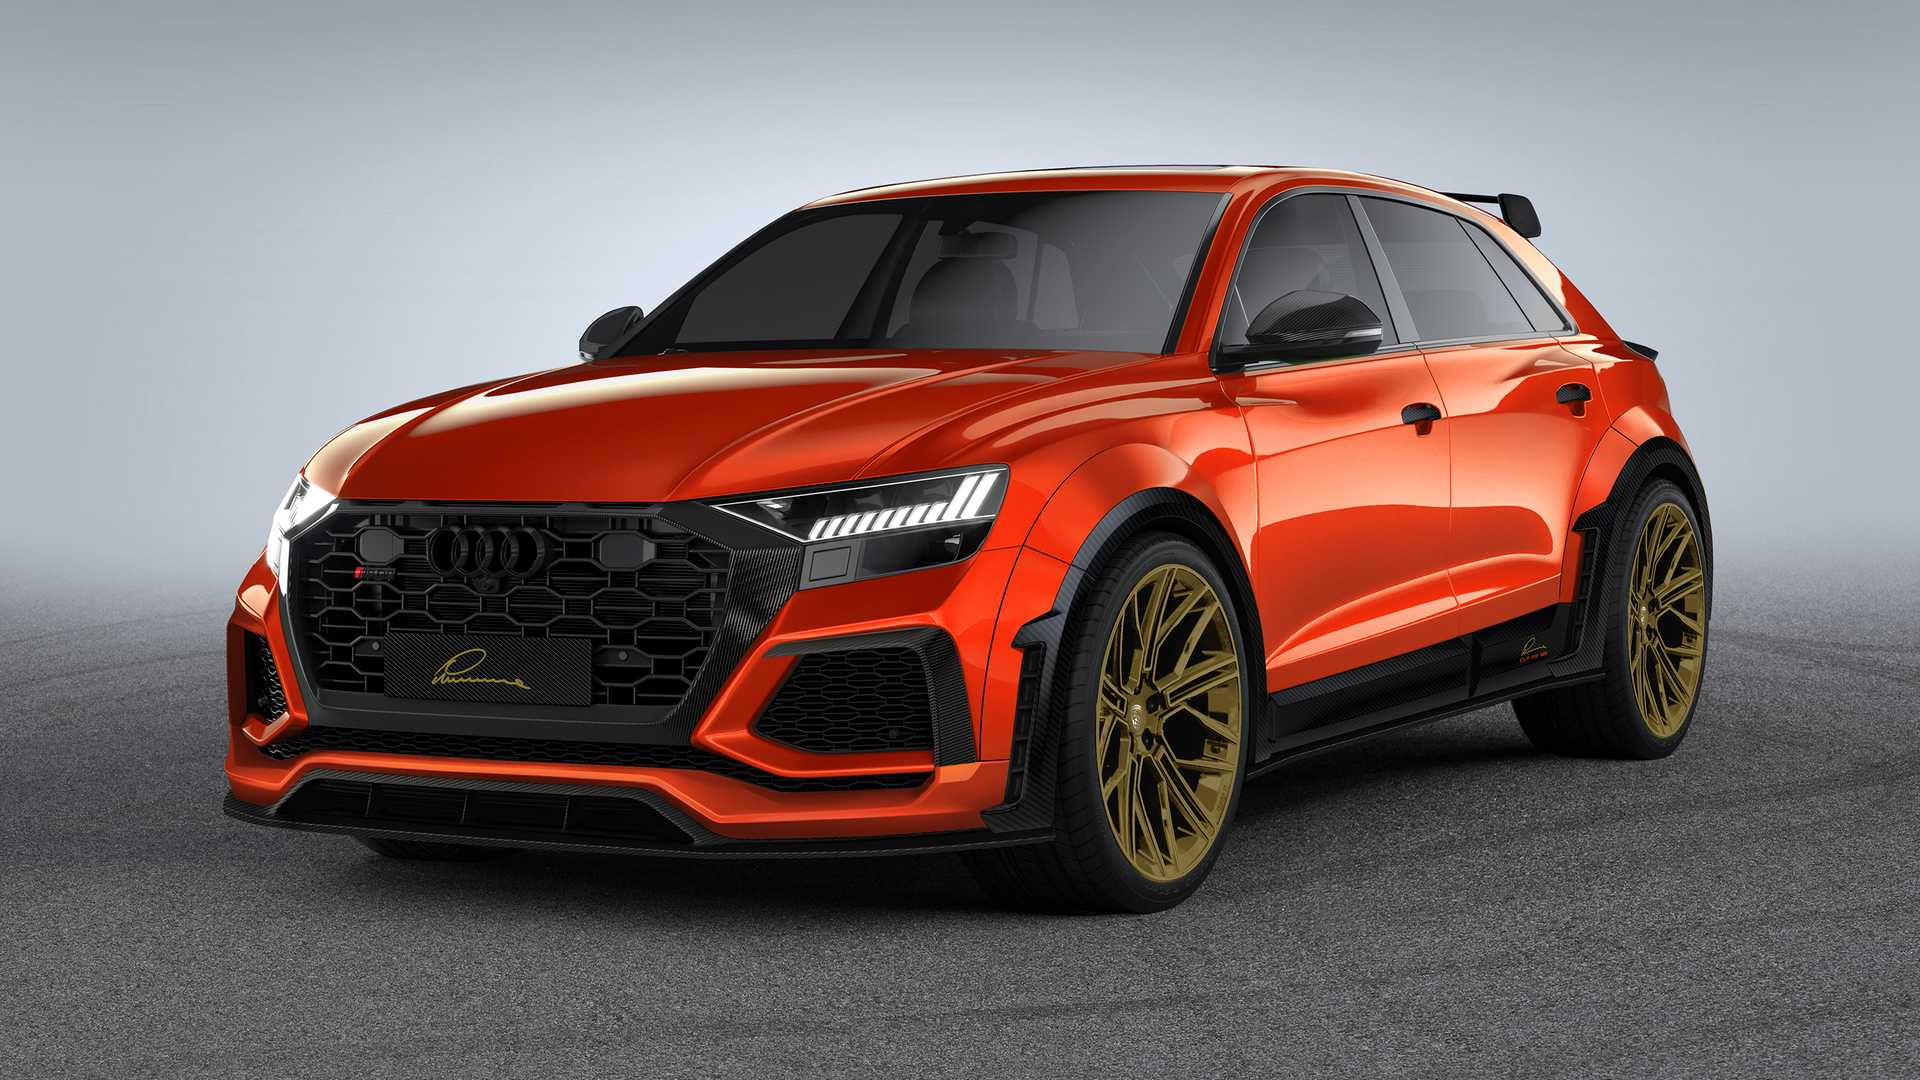 Audi-RS-Q8-CLR-8-RS-By-Lumma-Design-3